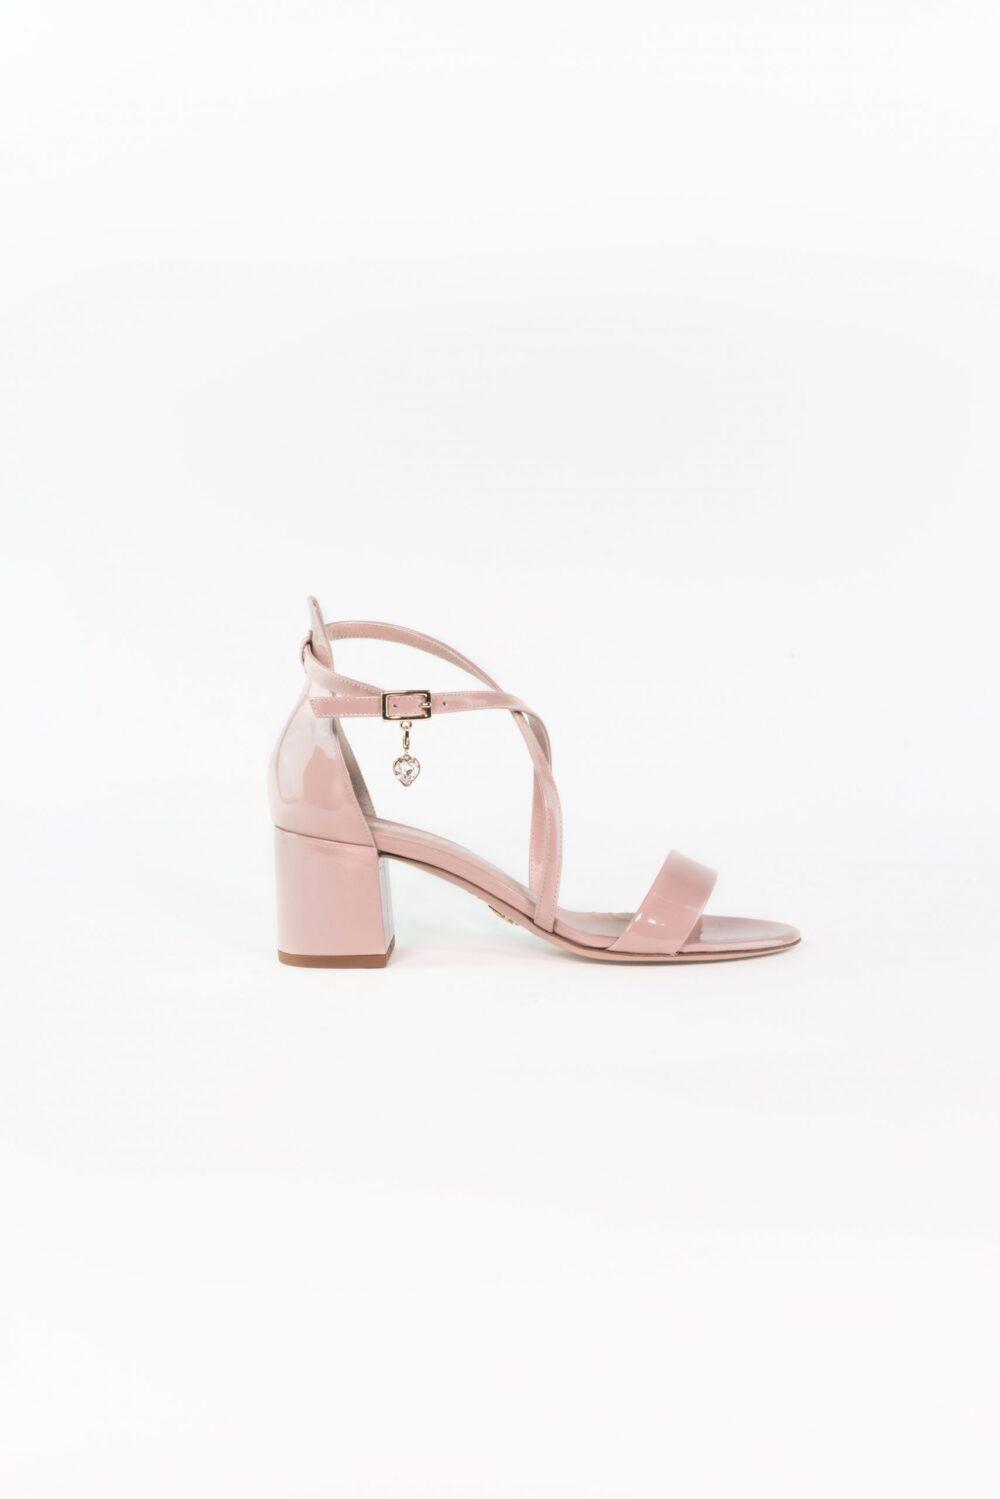 designer hochzeitsschuh lackleder rose charm emilia